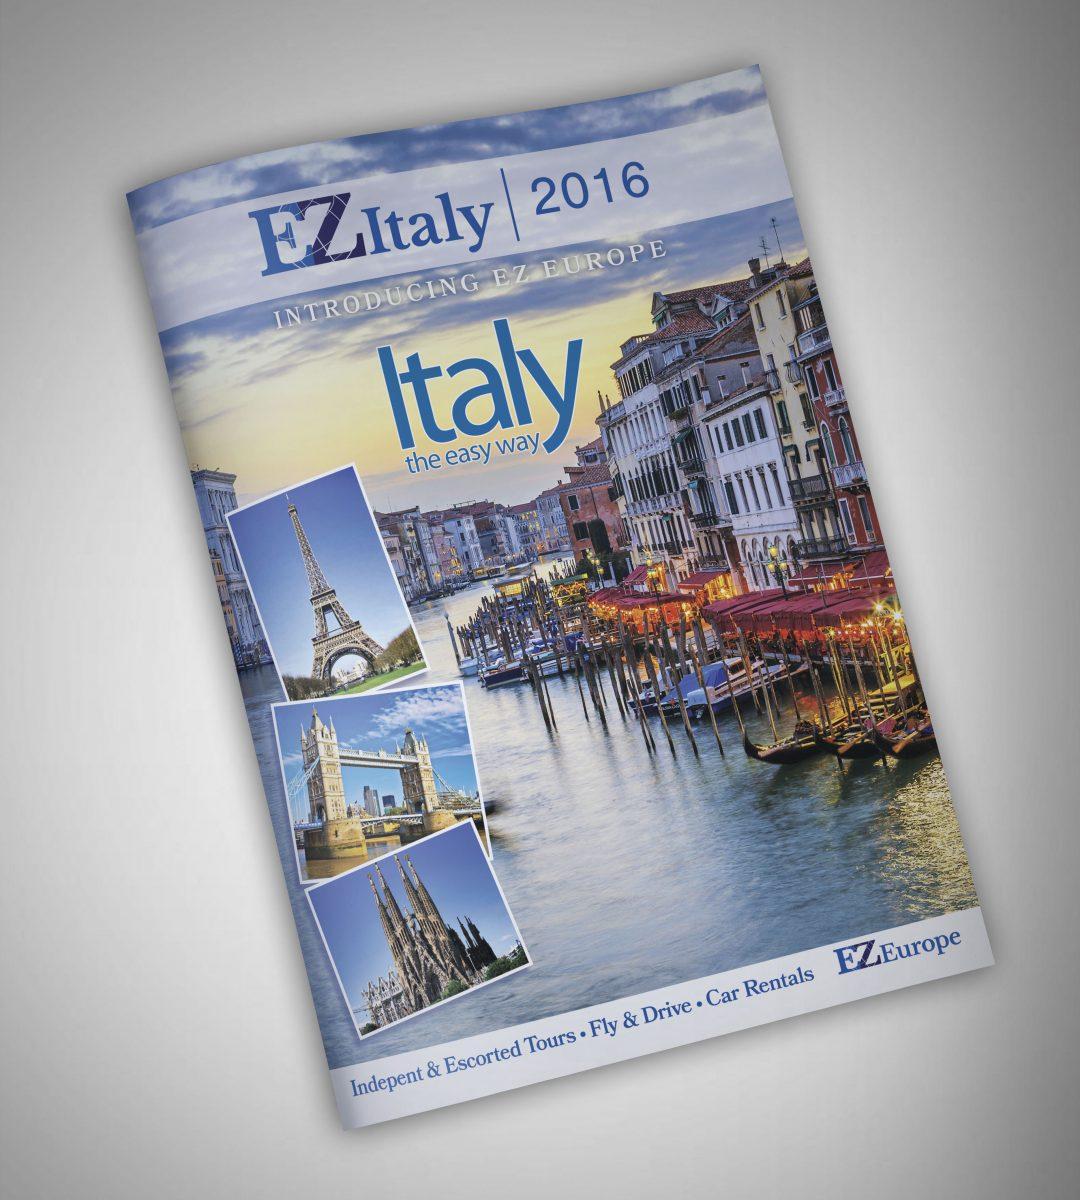 Cover Image Design for EZ Italy Catalog